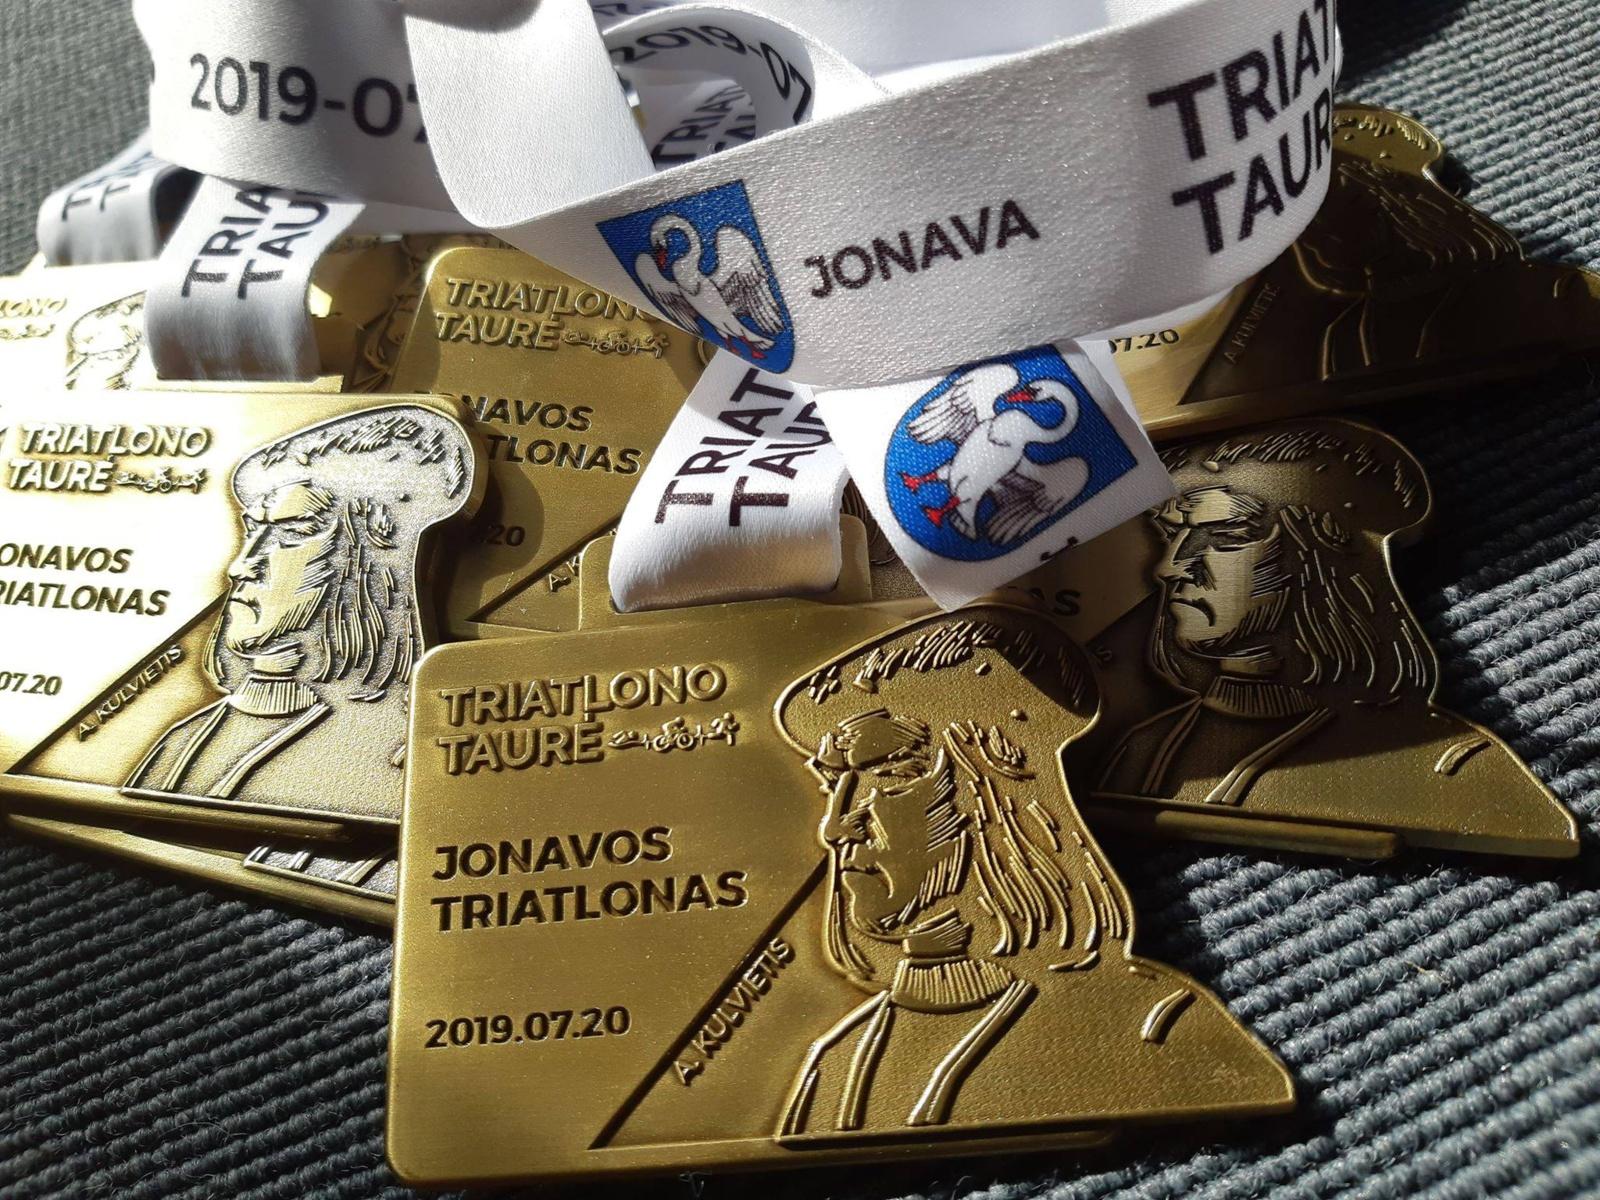 Šeštadienį Jonava judės triatlono ritmu